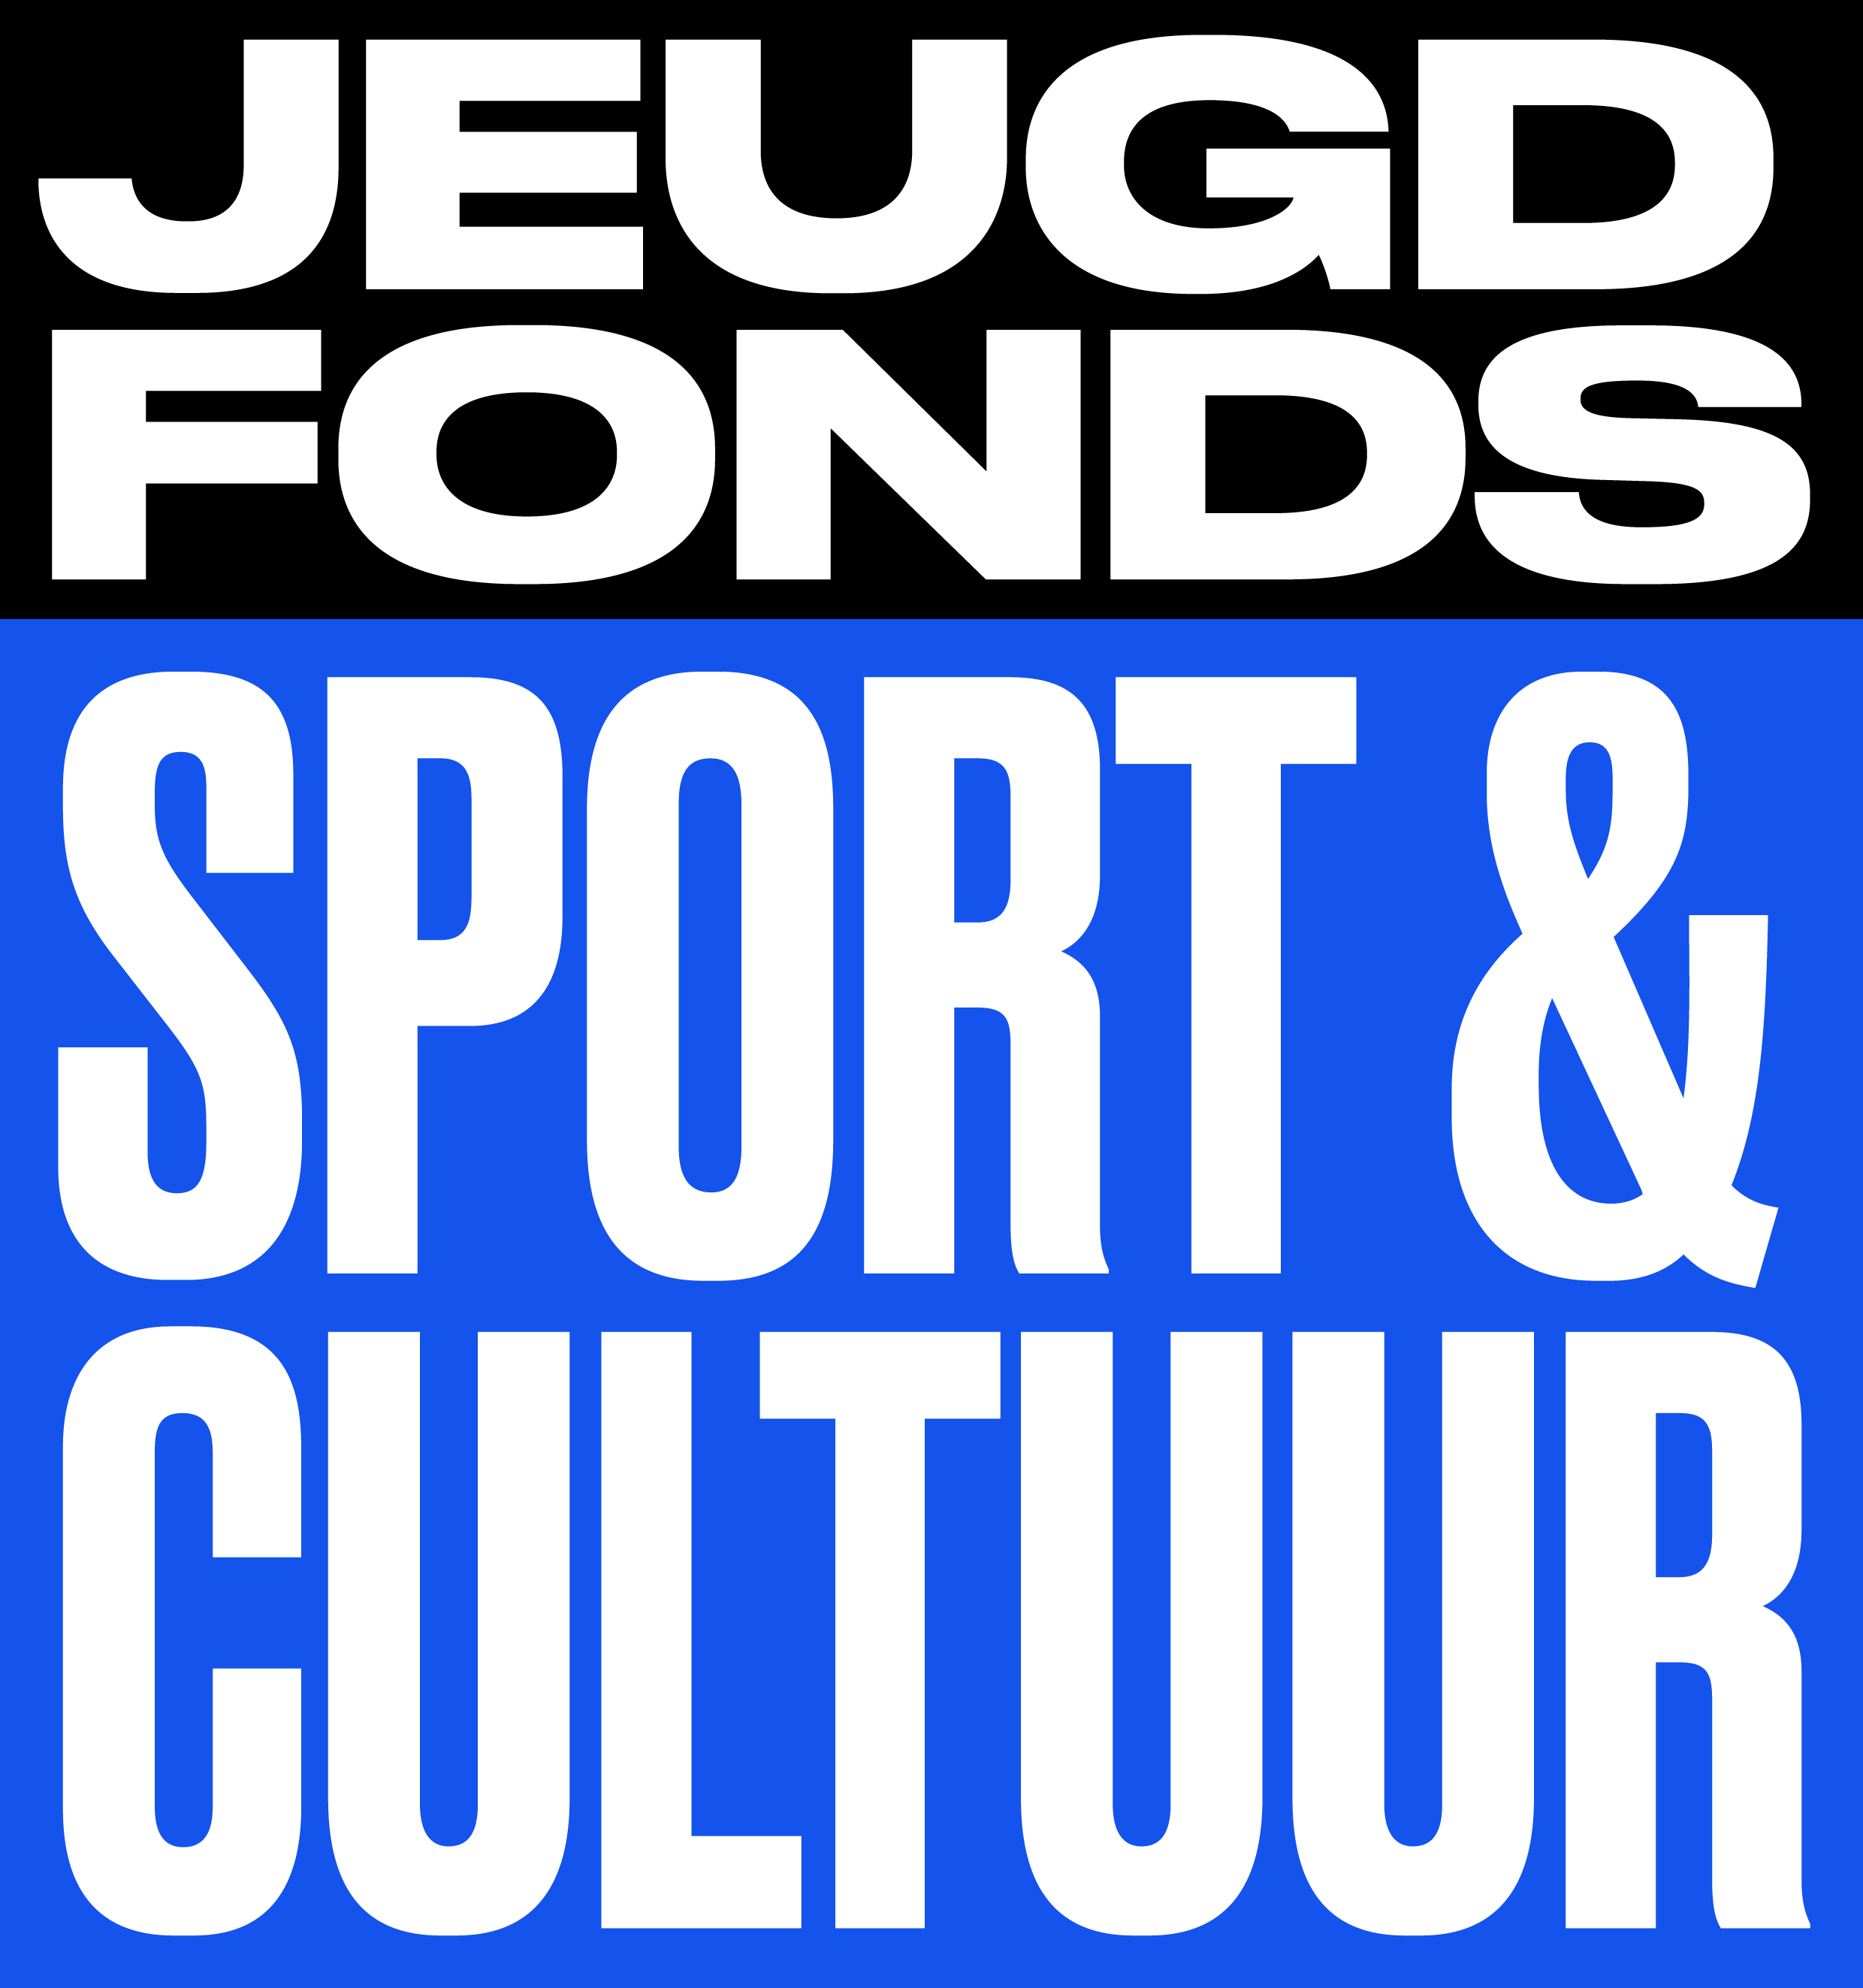 https://jeugdfondssportencultuur.nl